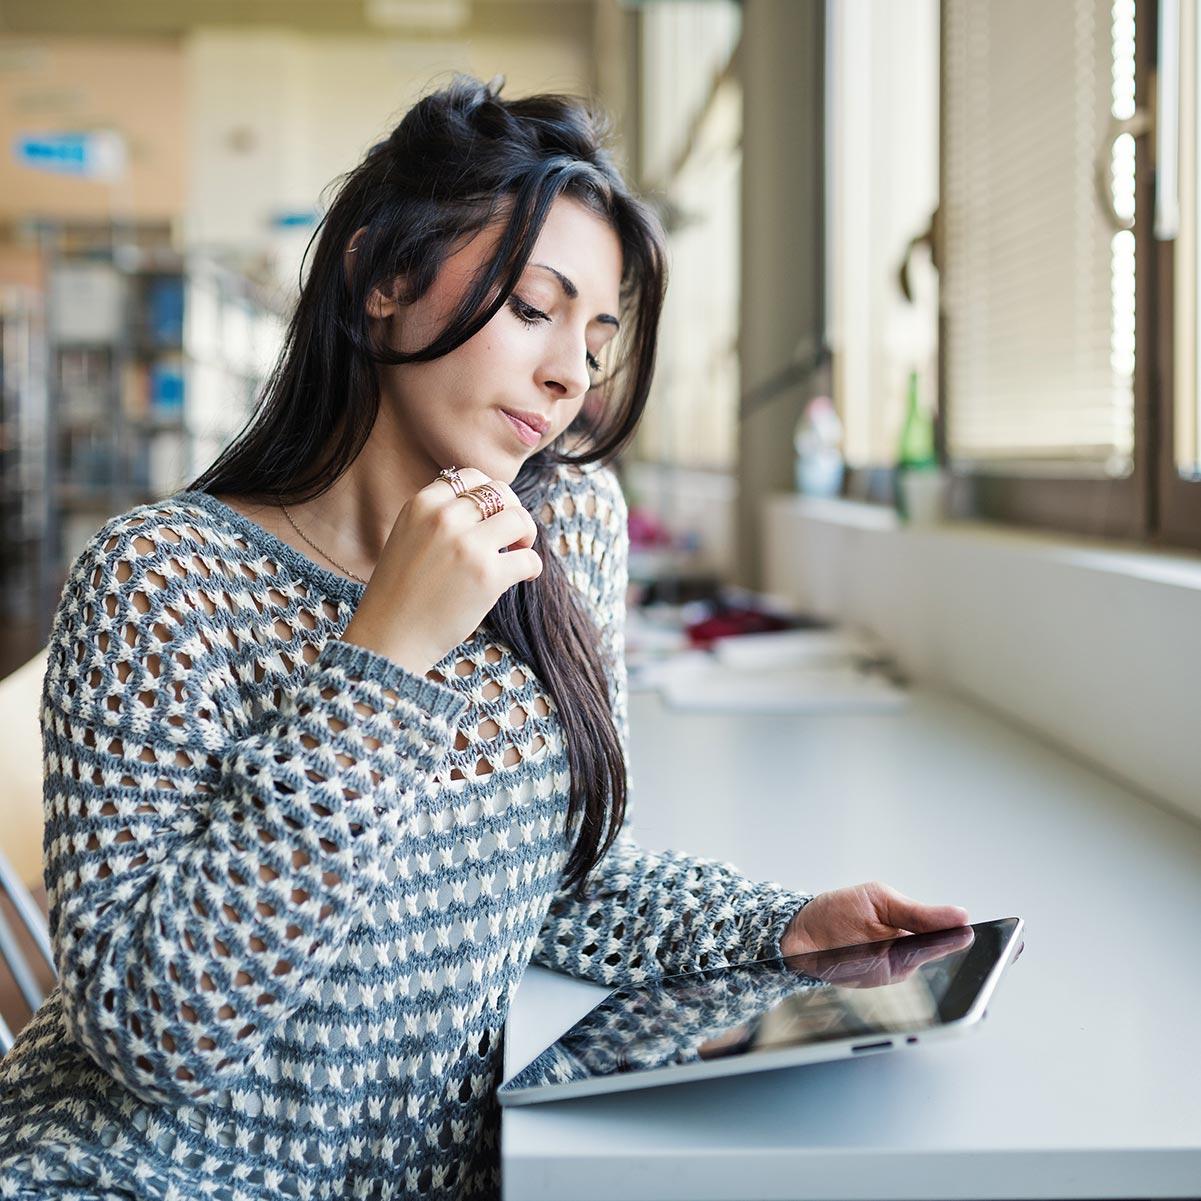 blogs voor ondernemers